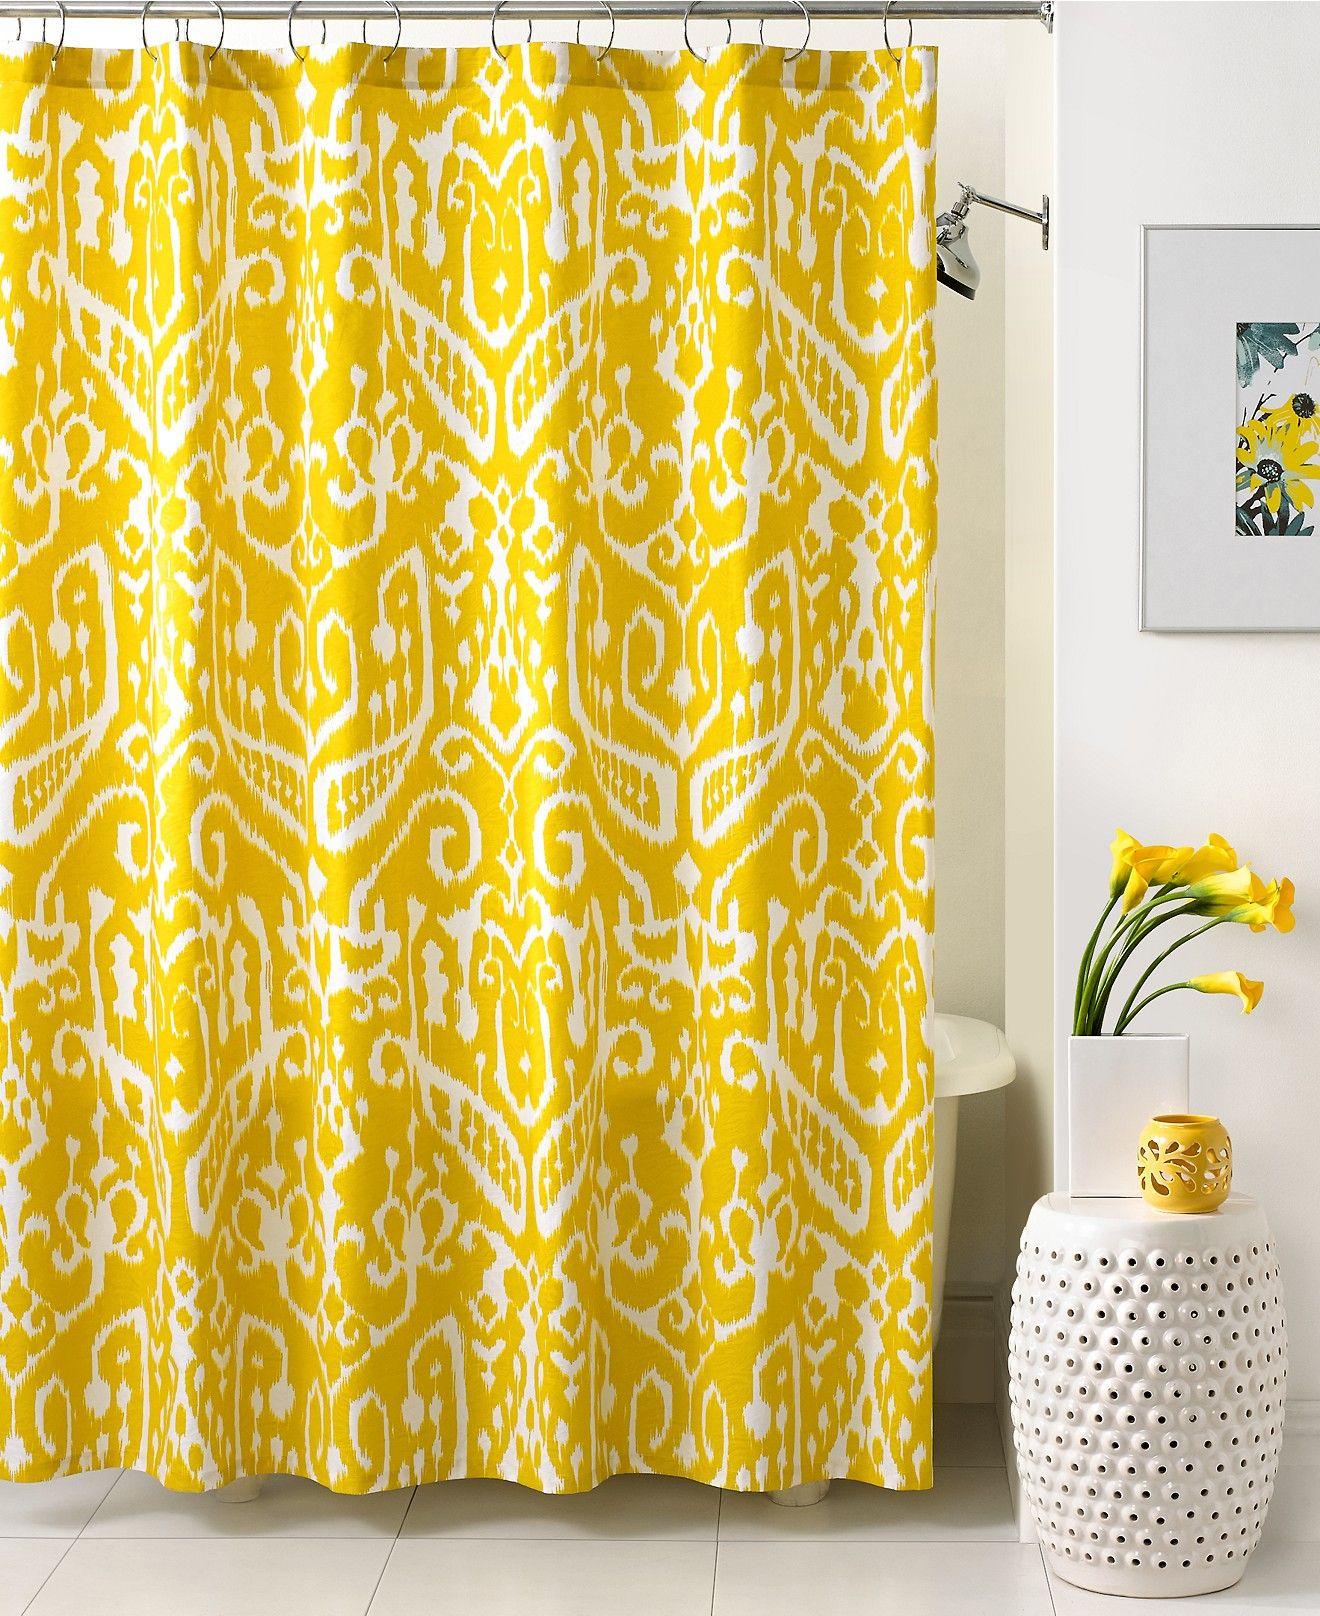 Trina Turk Bath Ikat Shower Curtain Shower Curtains